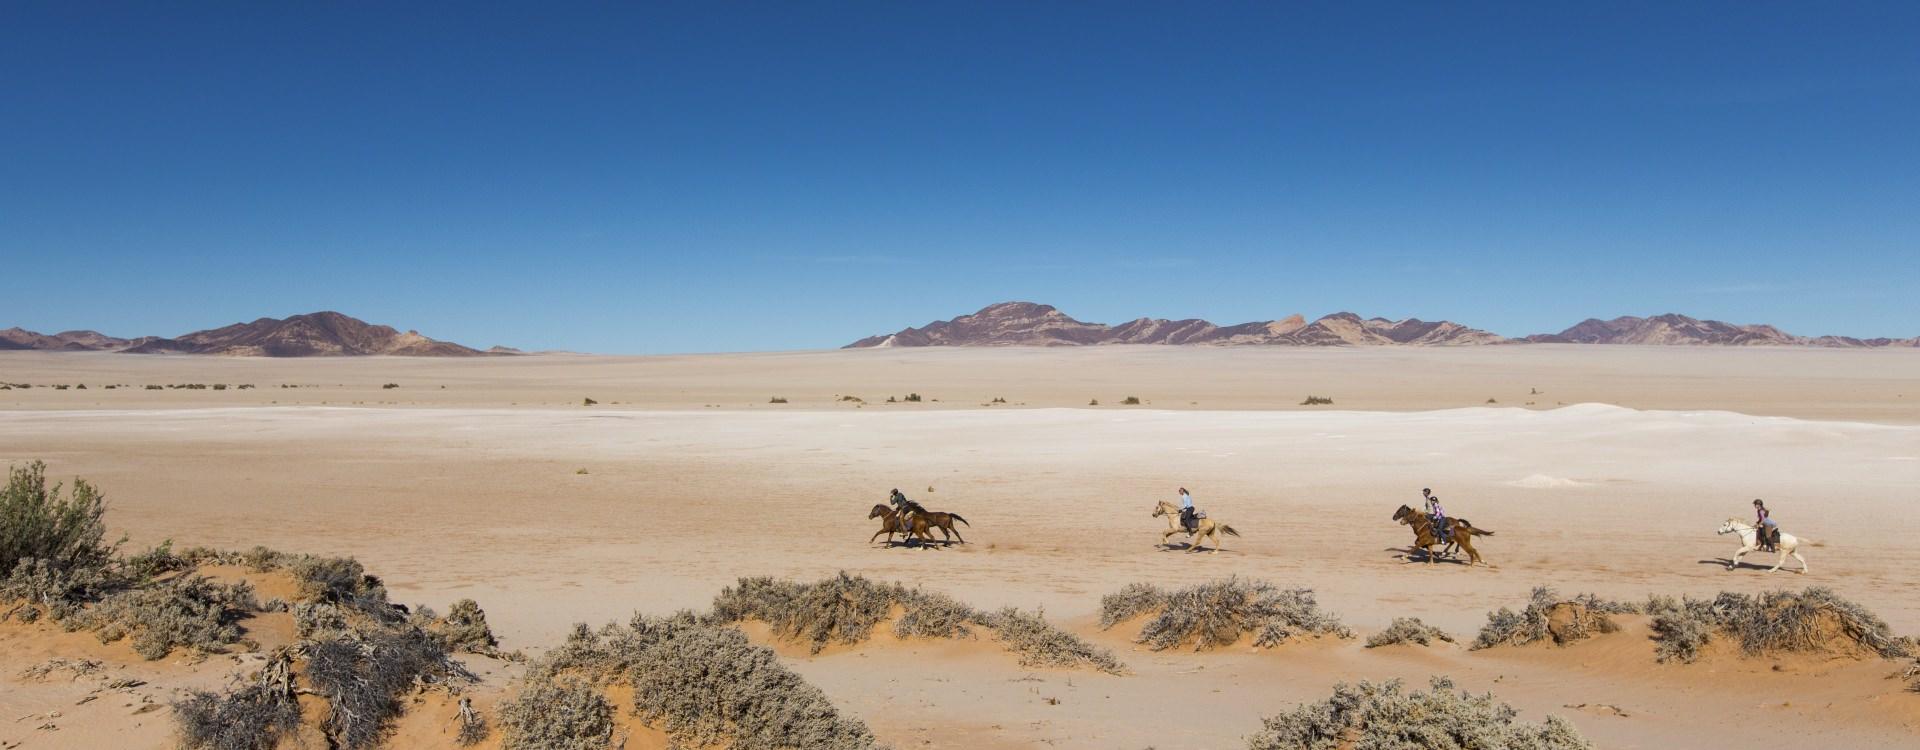 Horseback safari in Namibia